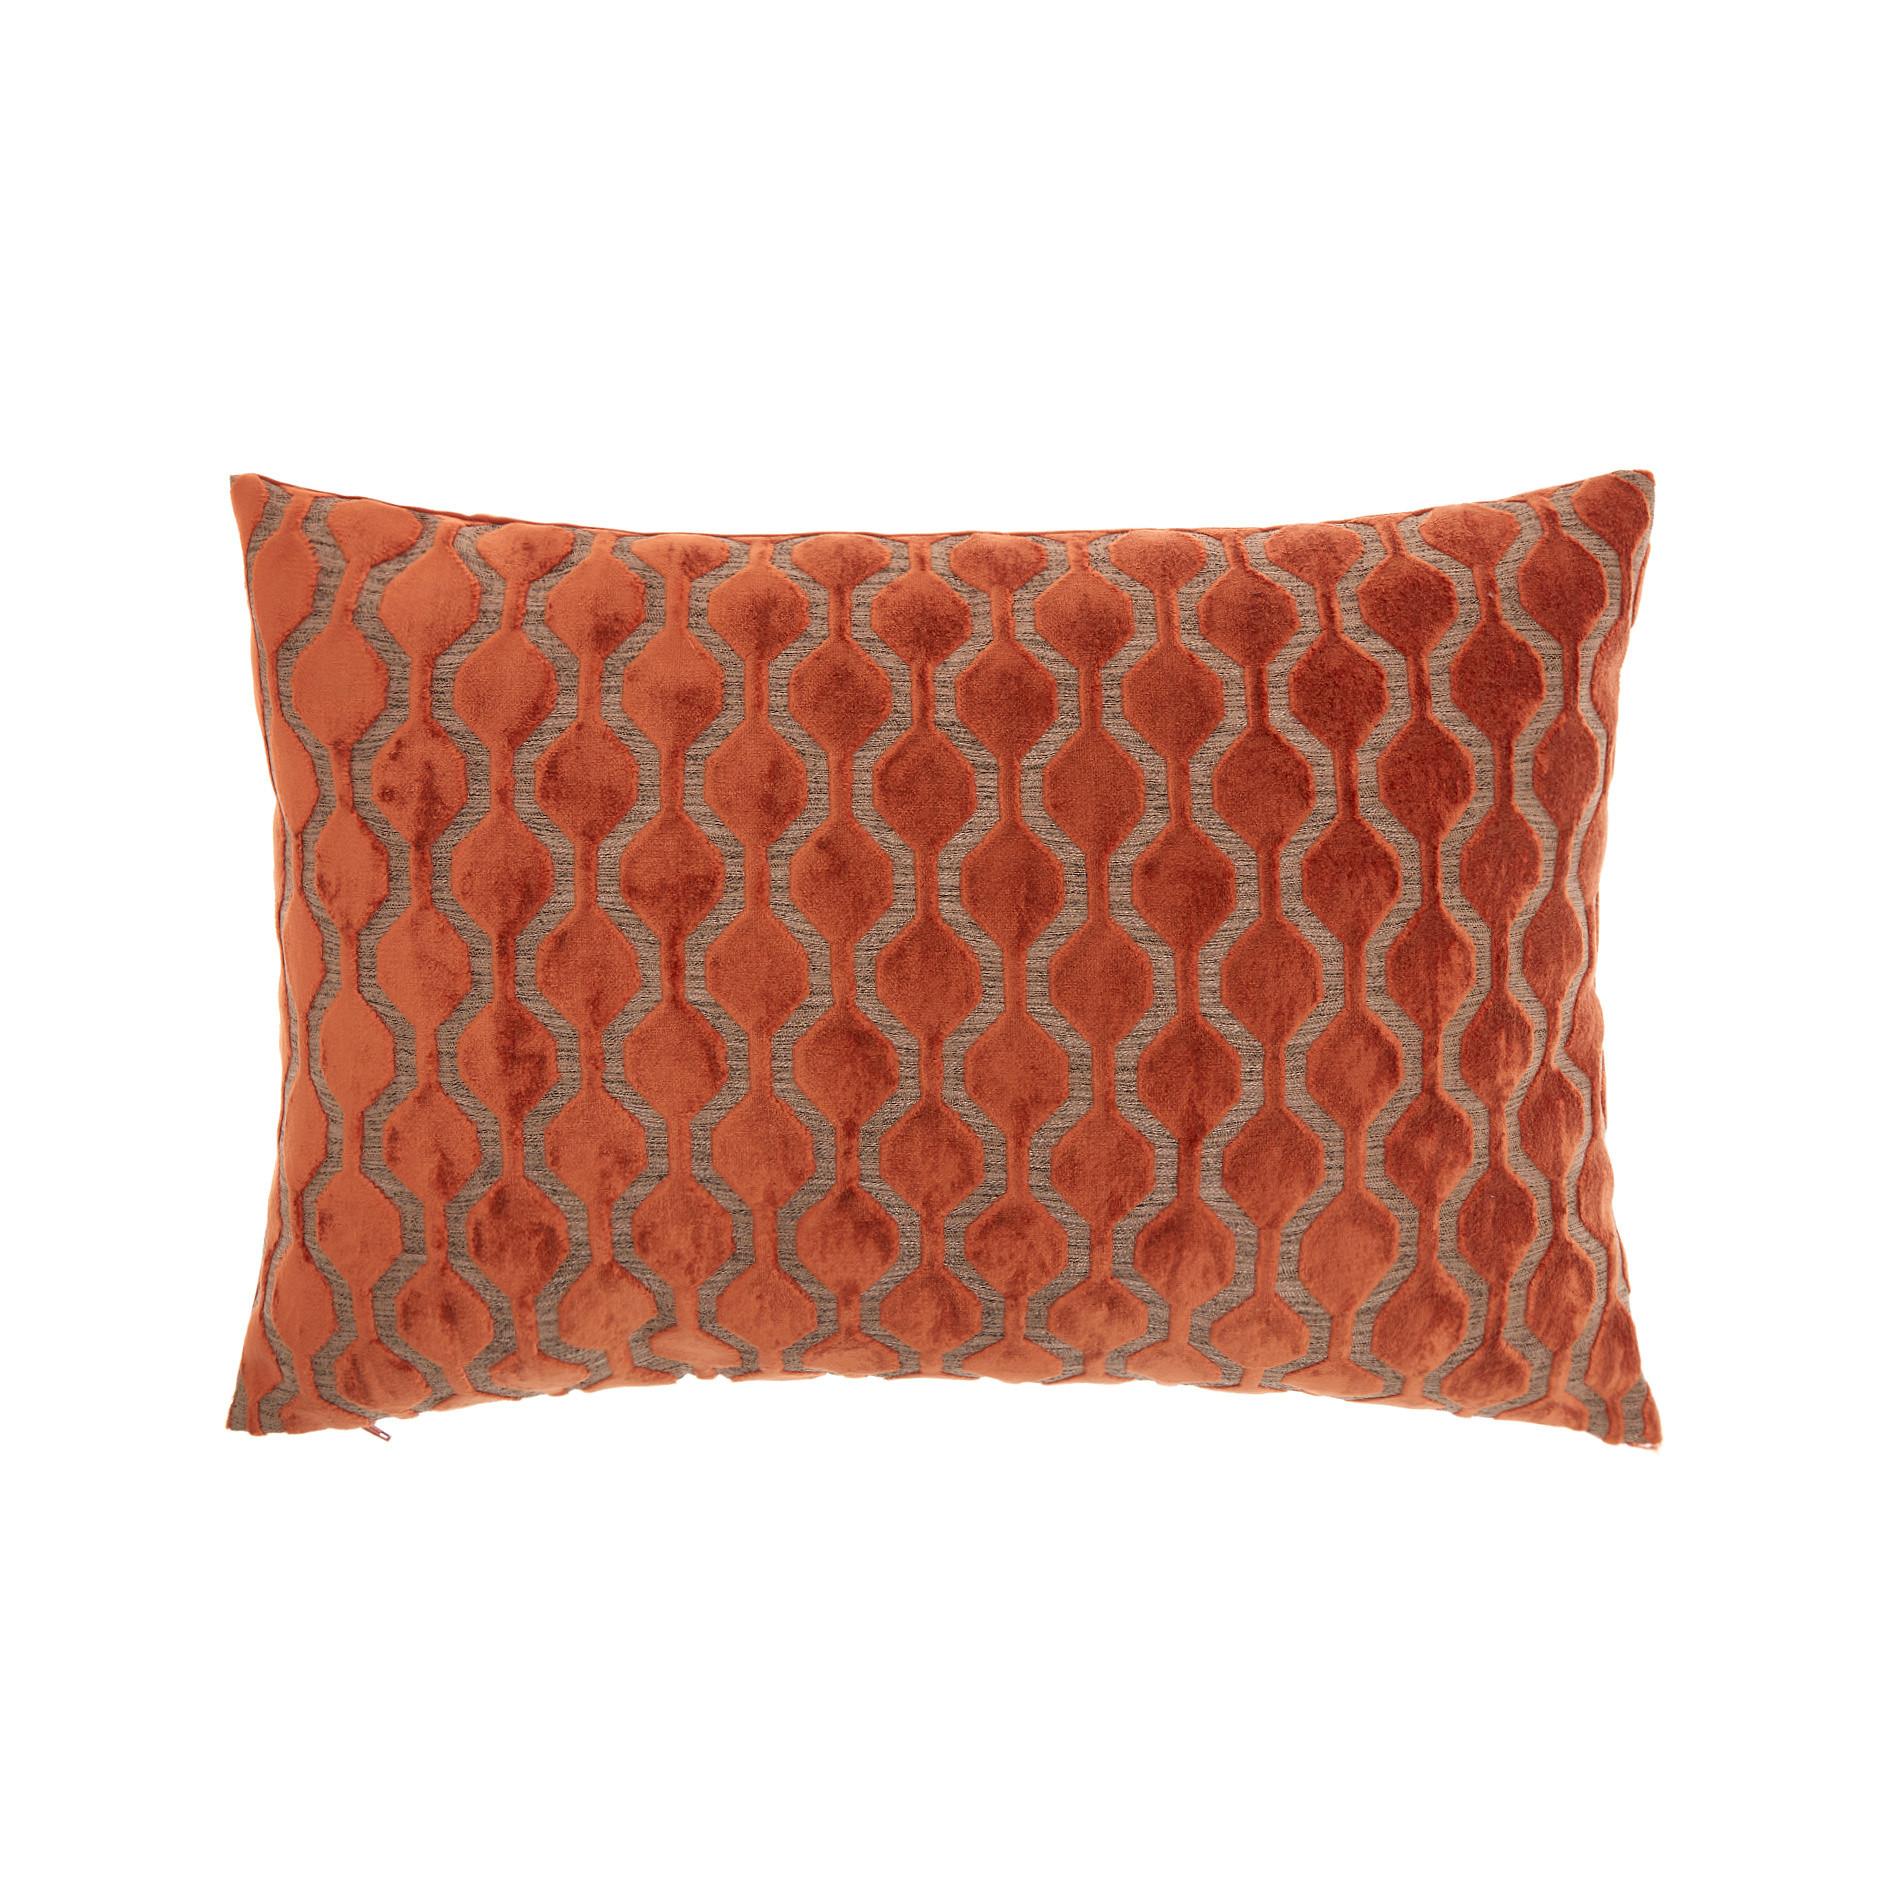 Cuscino velluto motivo geometrico 35x55cm, Marrone chiaro, large image number 0